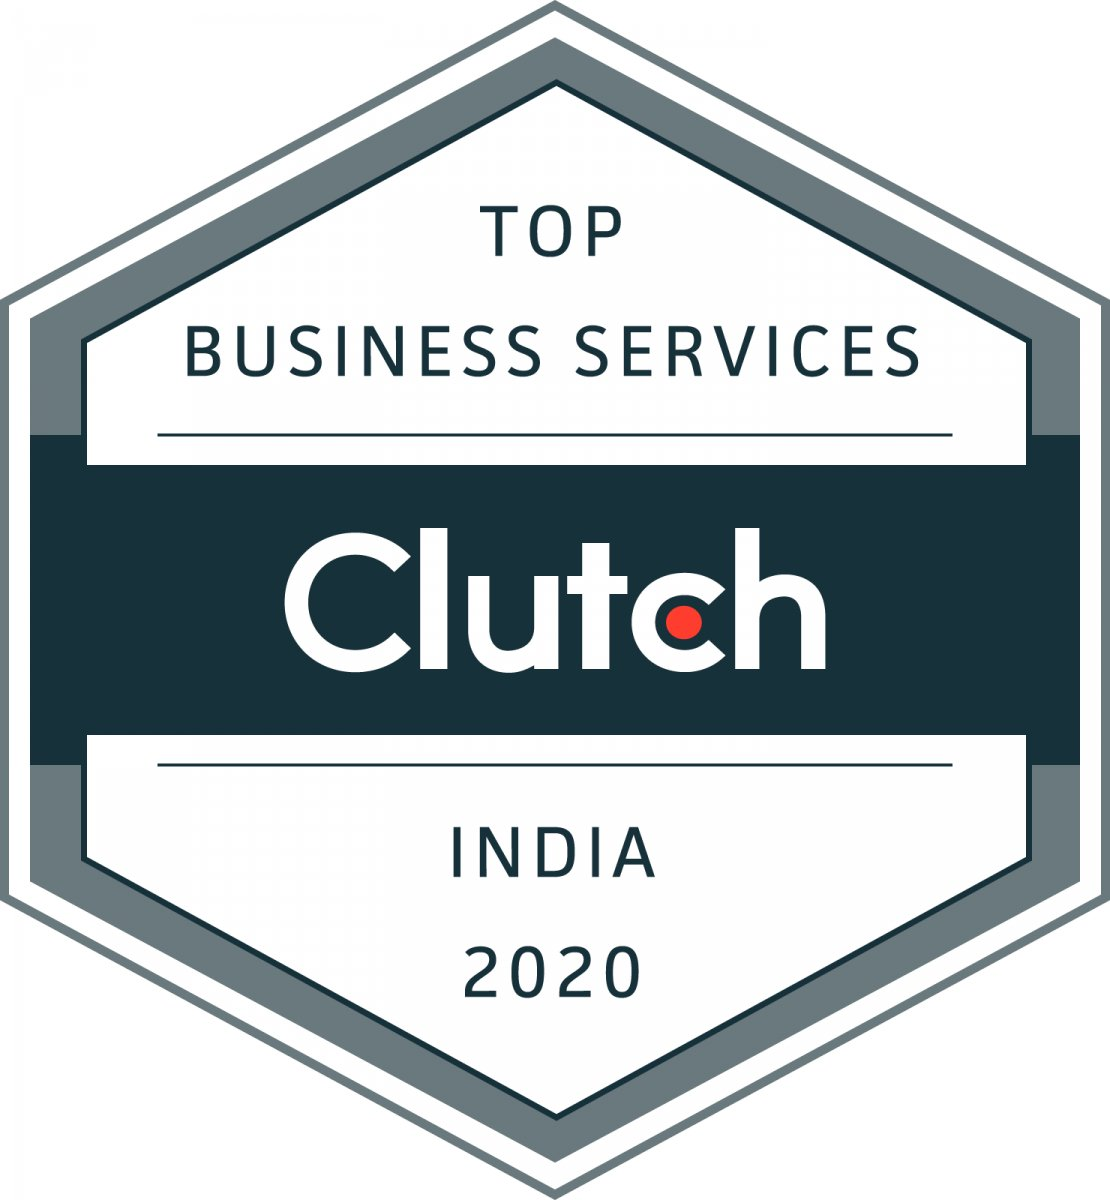 http://Clutch.co Reveals @kunshtech as one of the Highest-Ranking Business Service Providers in India: http://bit.ly/2VmJuhS  #webdevelopment #appdevelopment #appdeveloper #webdesign #Webdesigner #award #kudos #clutch #b2b #Developerpic.twitter.com/jfoLmGnl6b